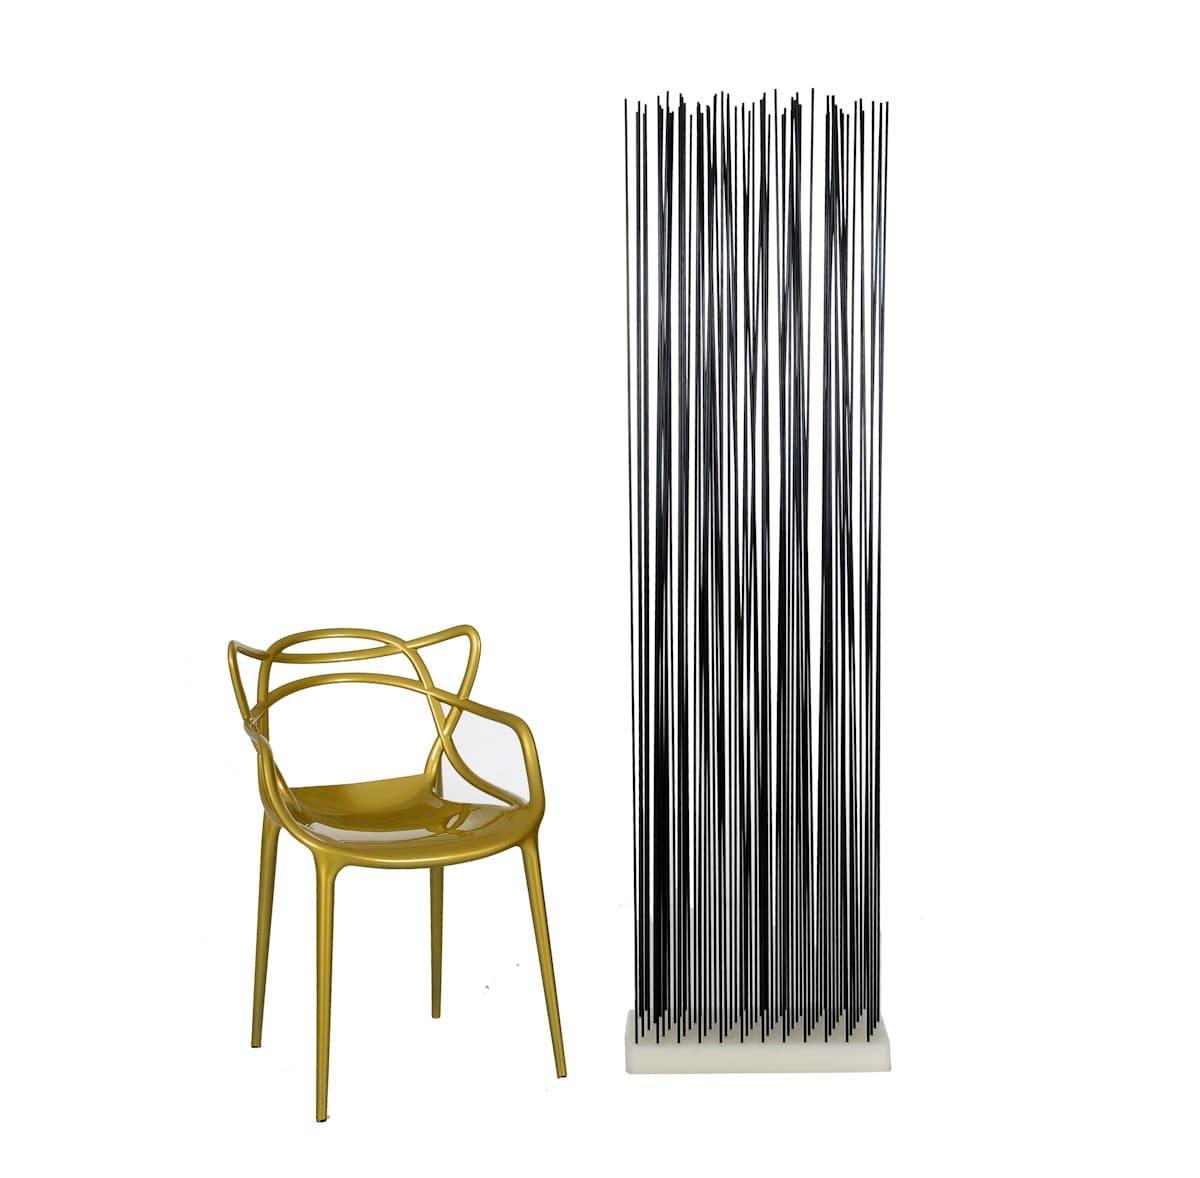 terrasse freistehend elegant starnberger see freistehend garten terrasse with terrasse. Black Bedroom Furniture Sets. Home Design Ideas